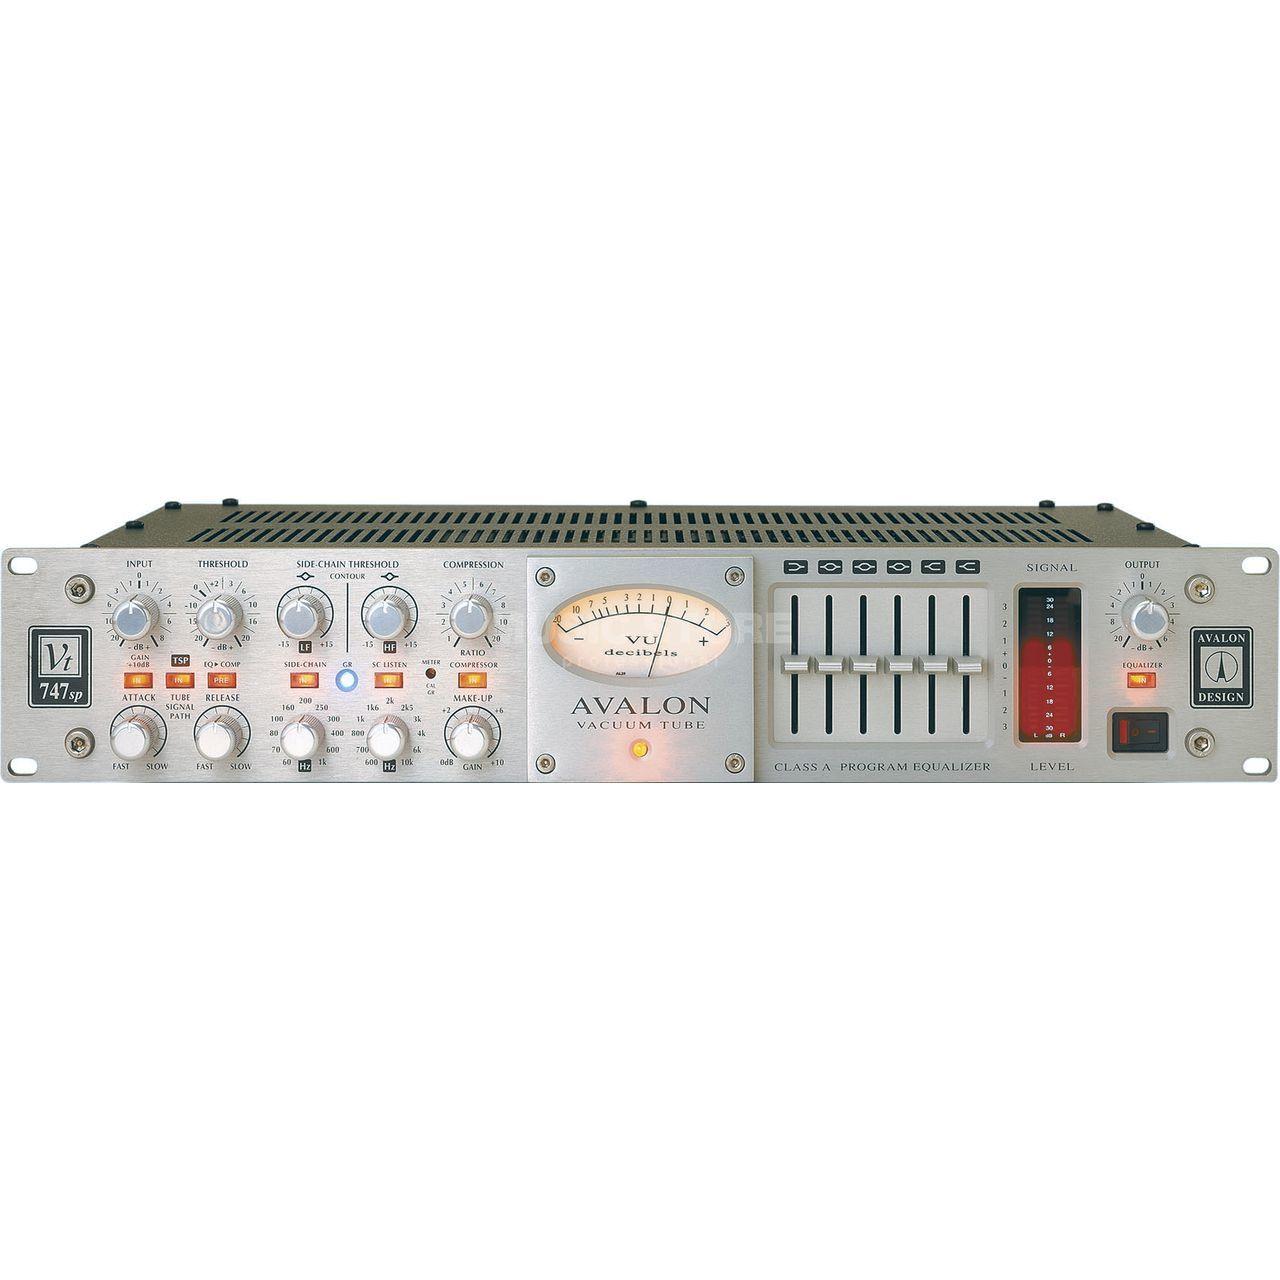 Avalon Design VT-747SP Stereo Compressor | DV247 | en-GB